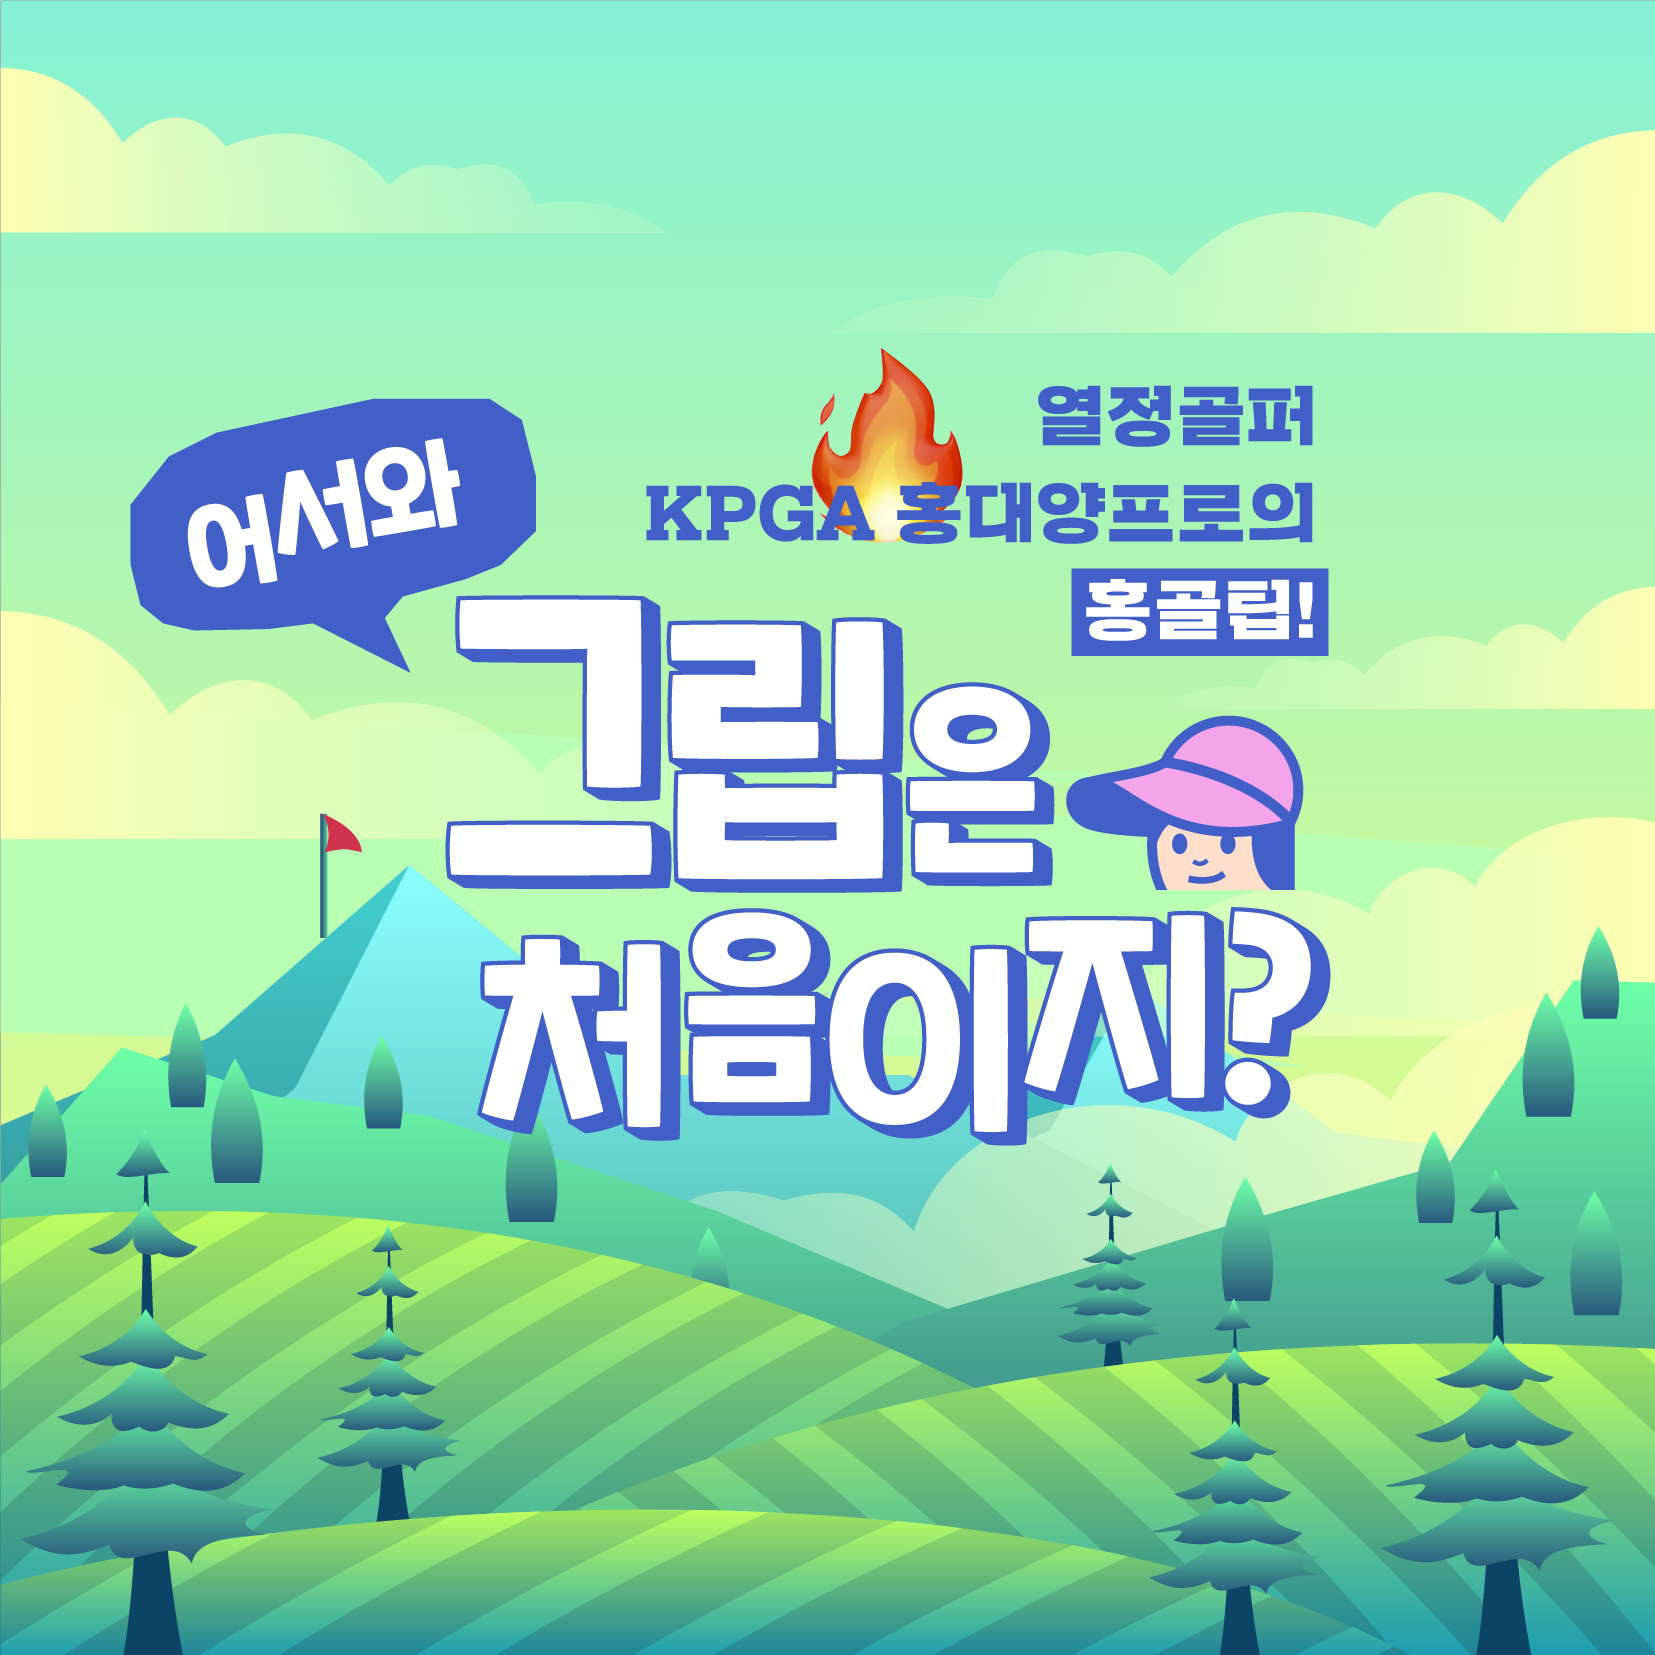 kpga-홍대양-프로-x-김캐디-올바른-골프-그립-잡는-법-홍골팁-1탄